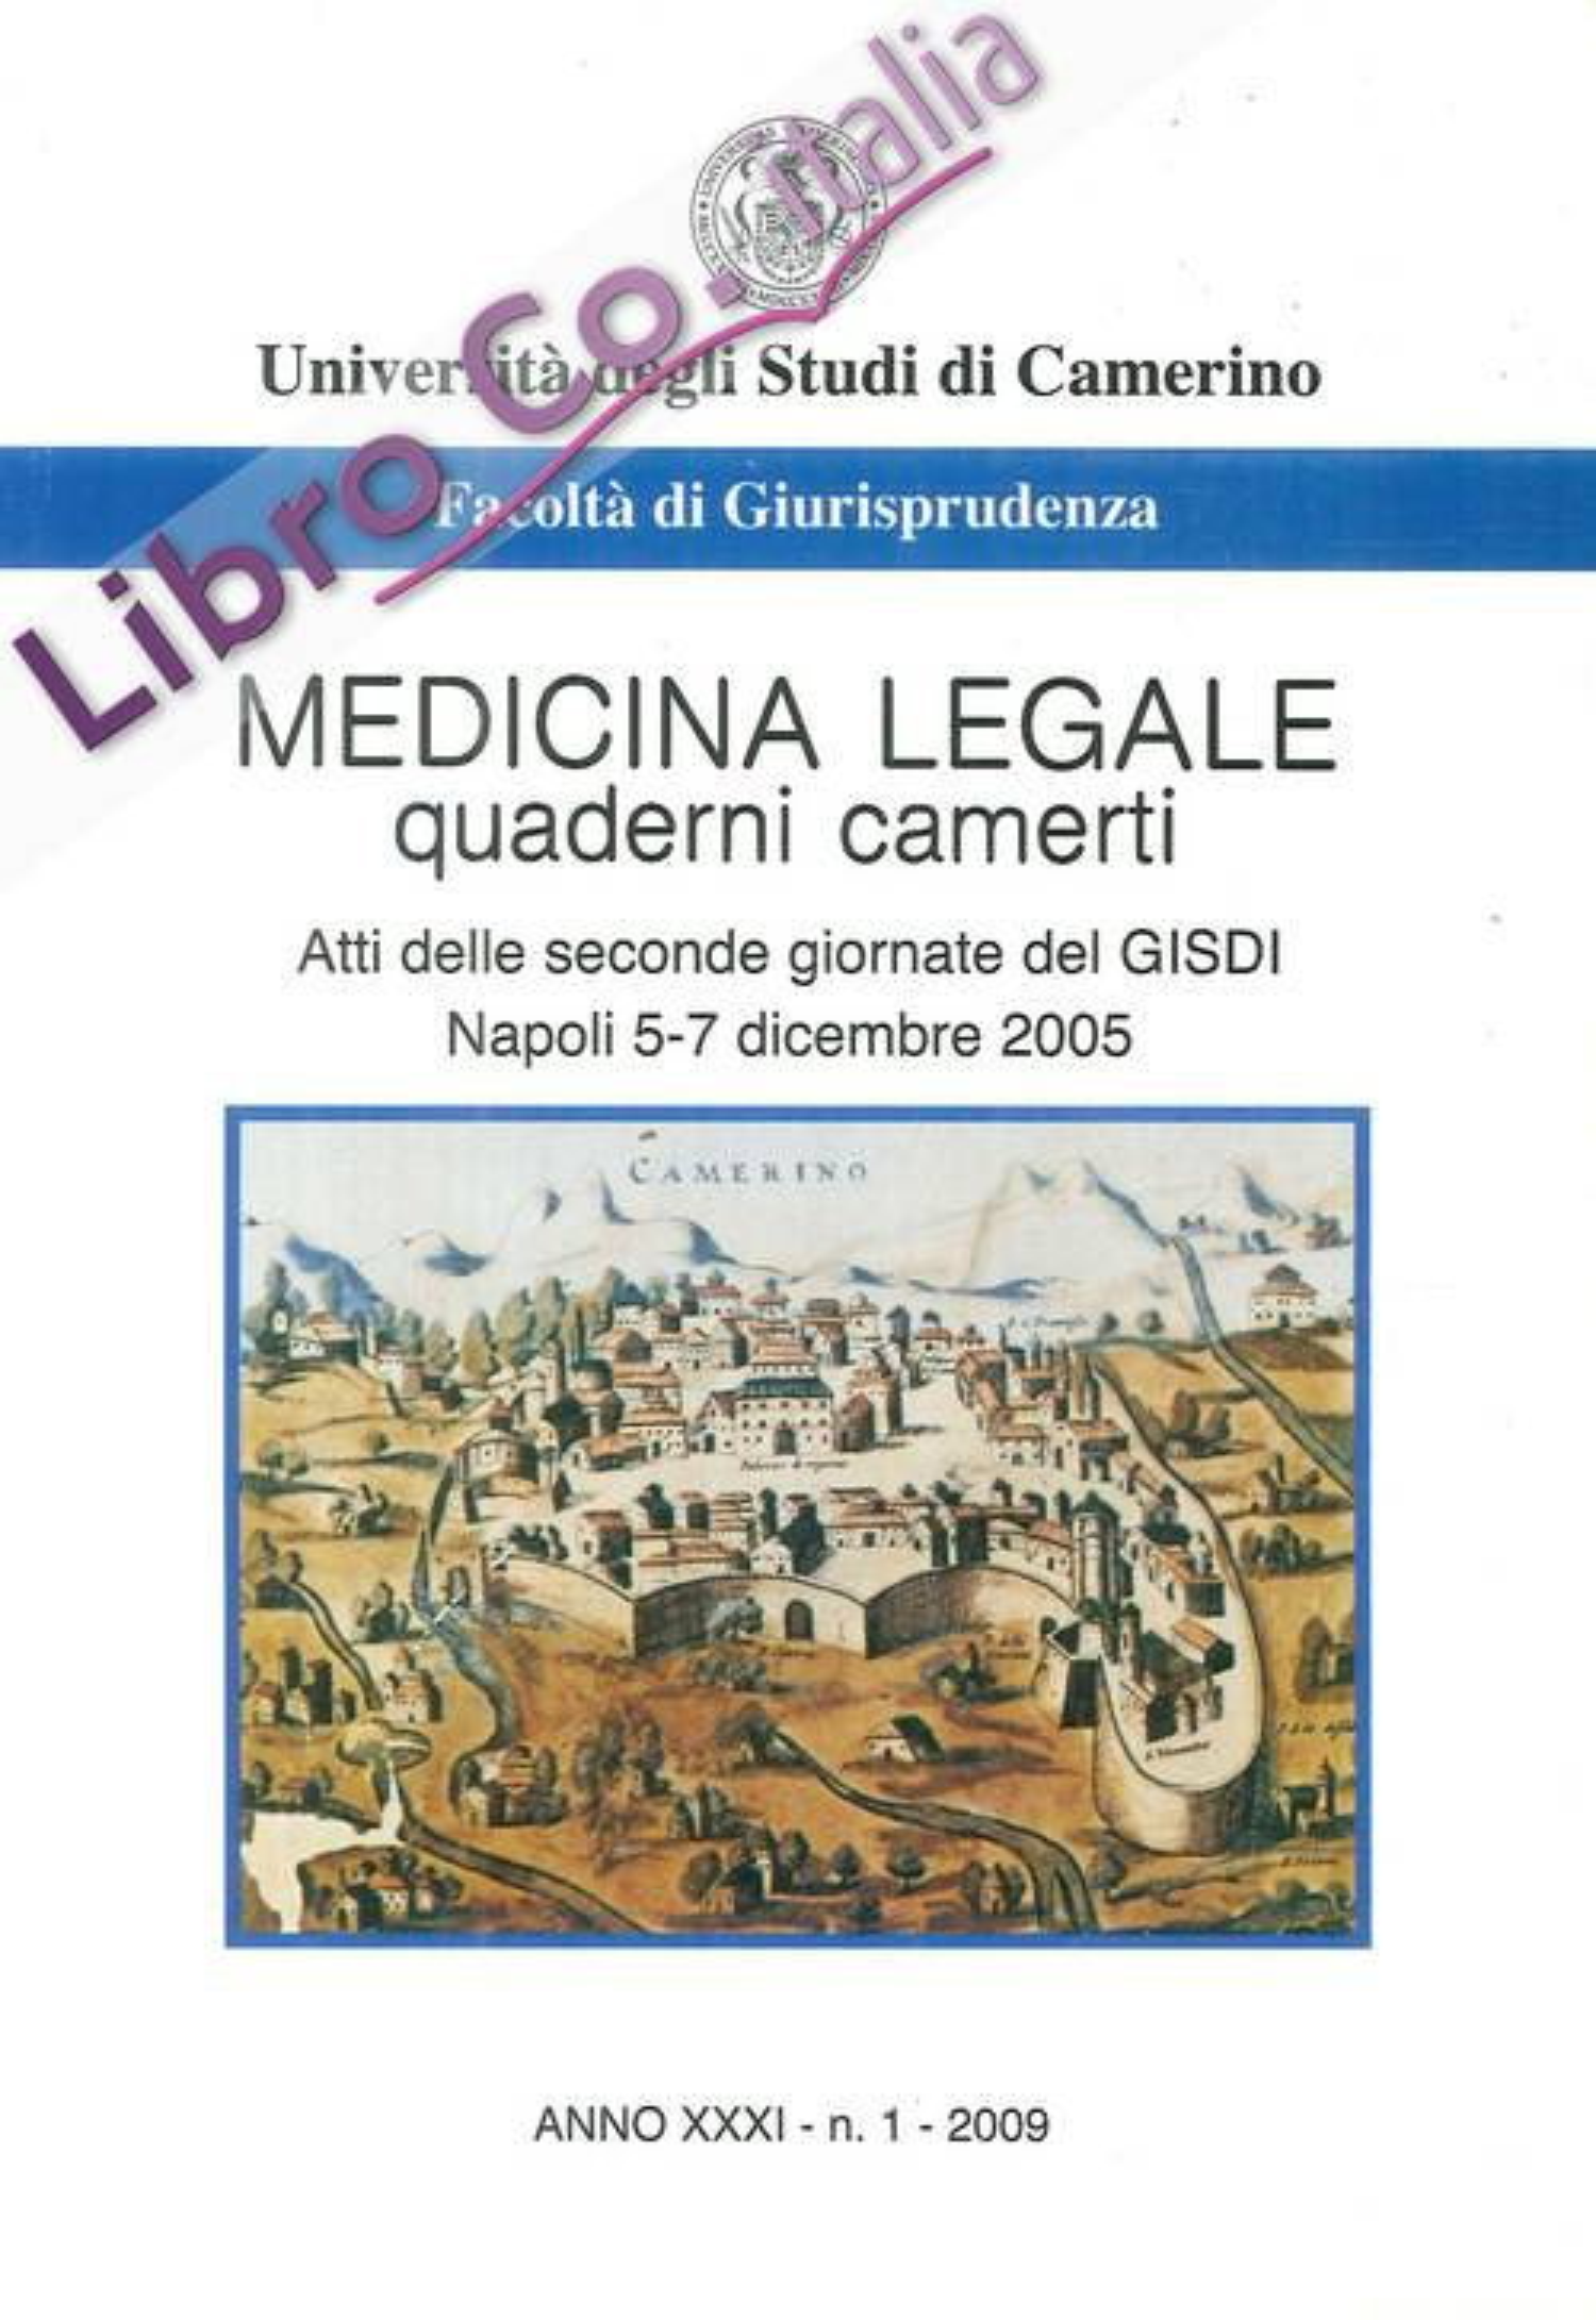 Medicina Legale Quaderni Camerti. 6 volumi